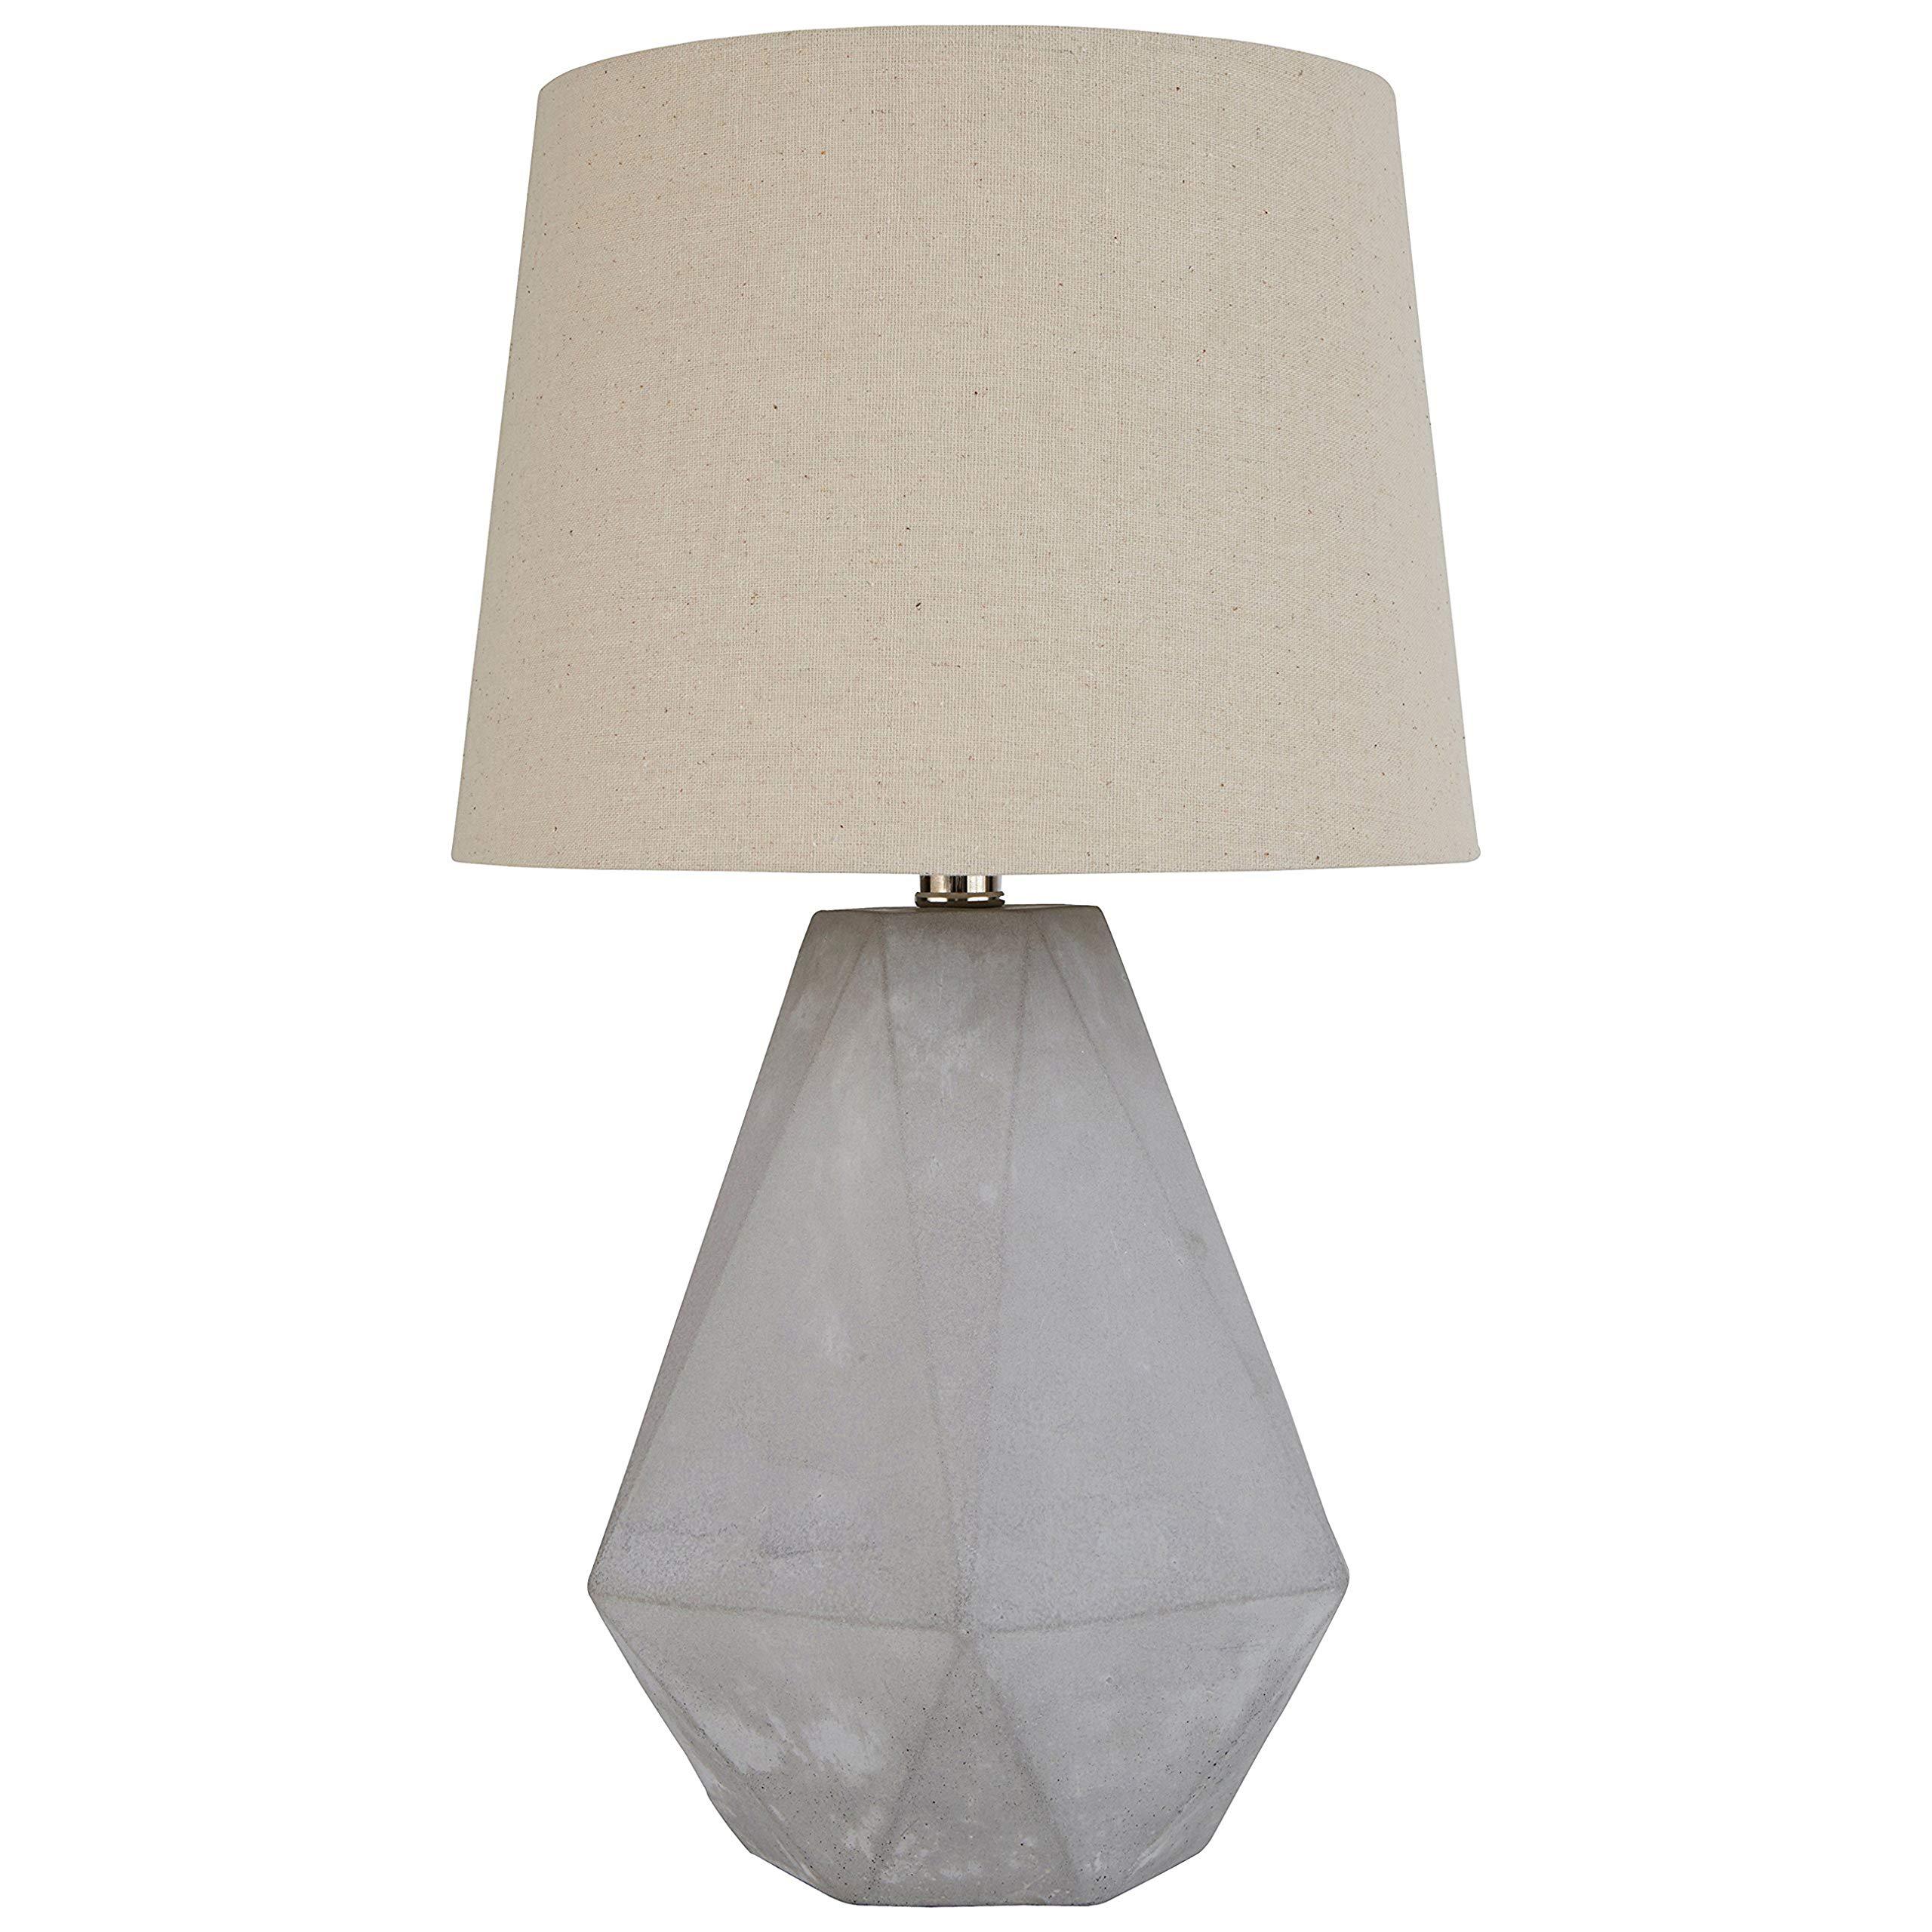 Rivet Mid Century Modern Diamond Cut Concrete Decor Bedside Table Desk Lamp With Light Bulb - 10 x 10 x 20 Inches, Nickel Finish